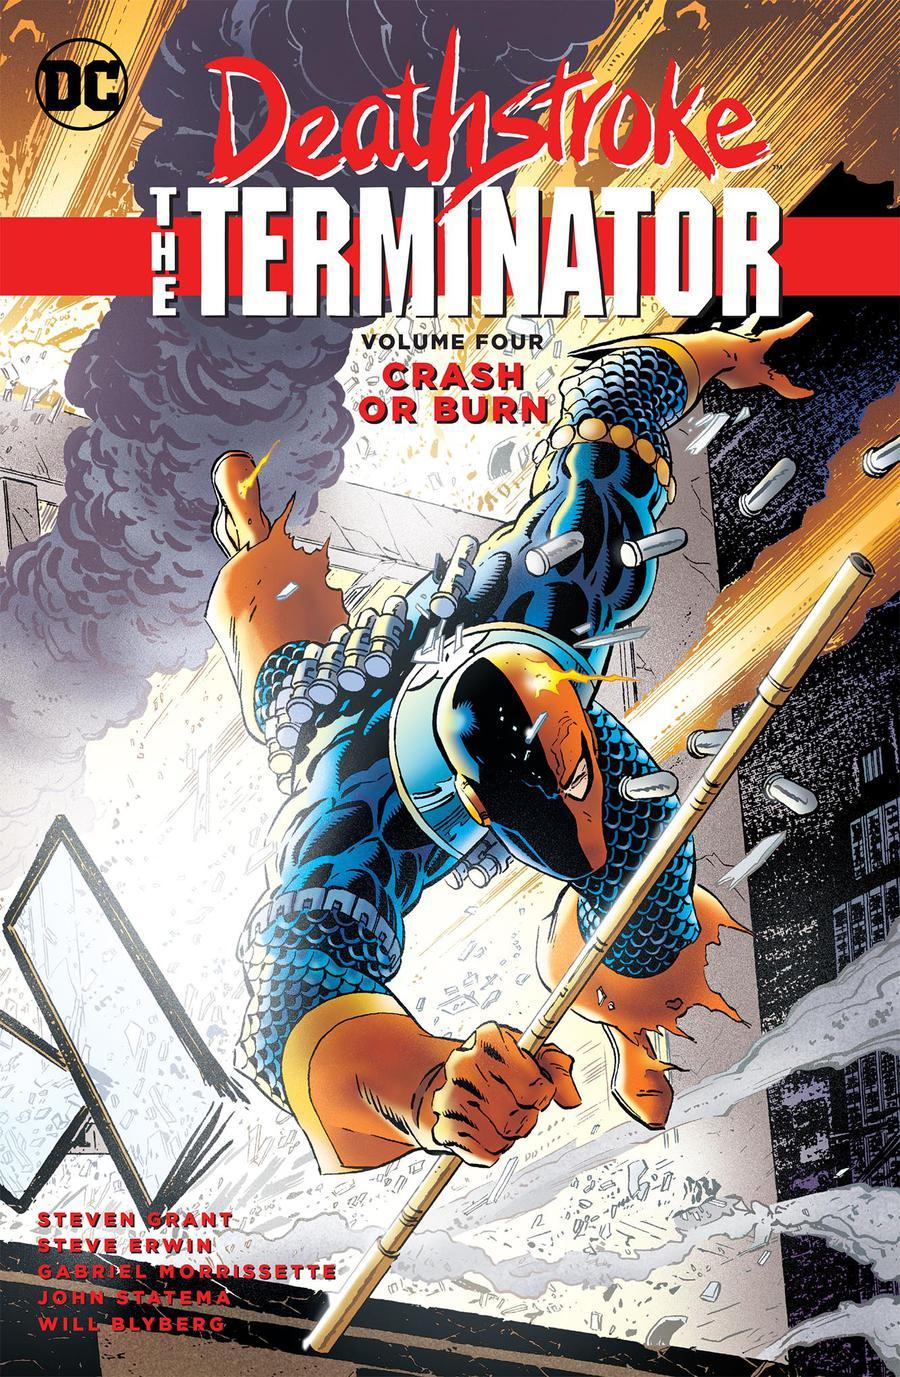 Deathstroke The Terminator Vol 4 Crash Or Burn TP